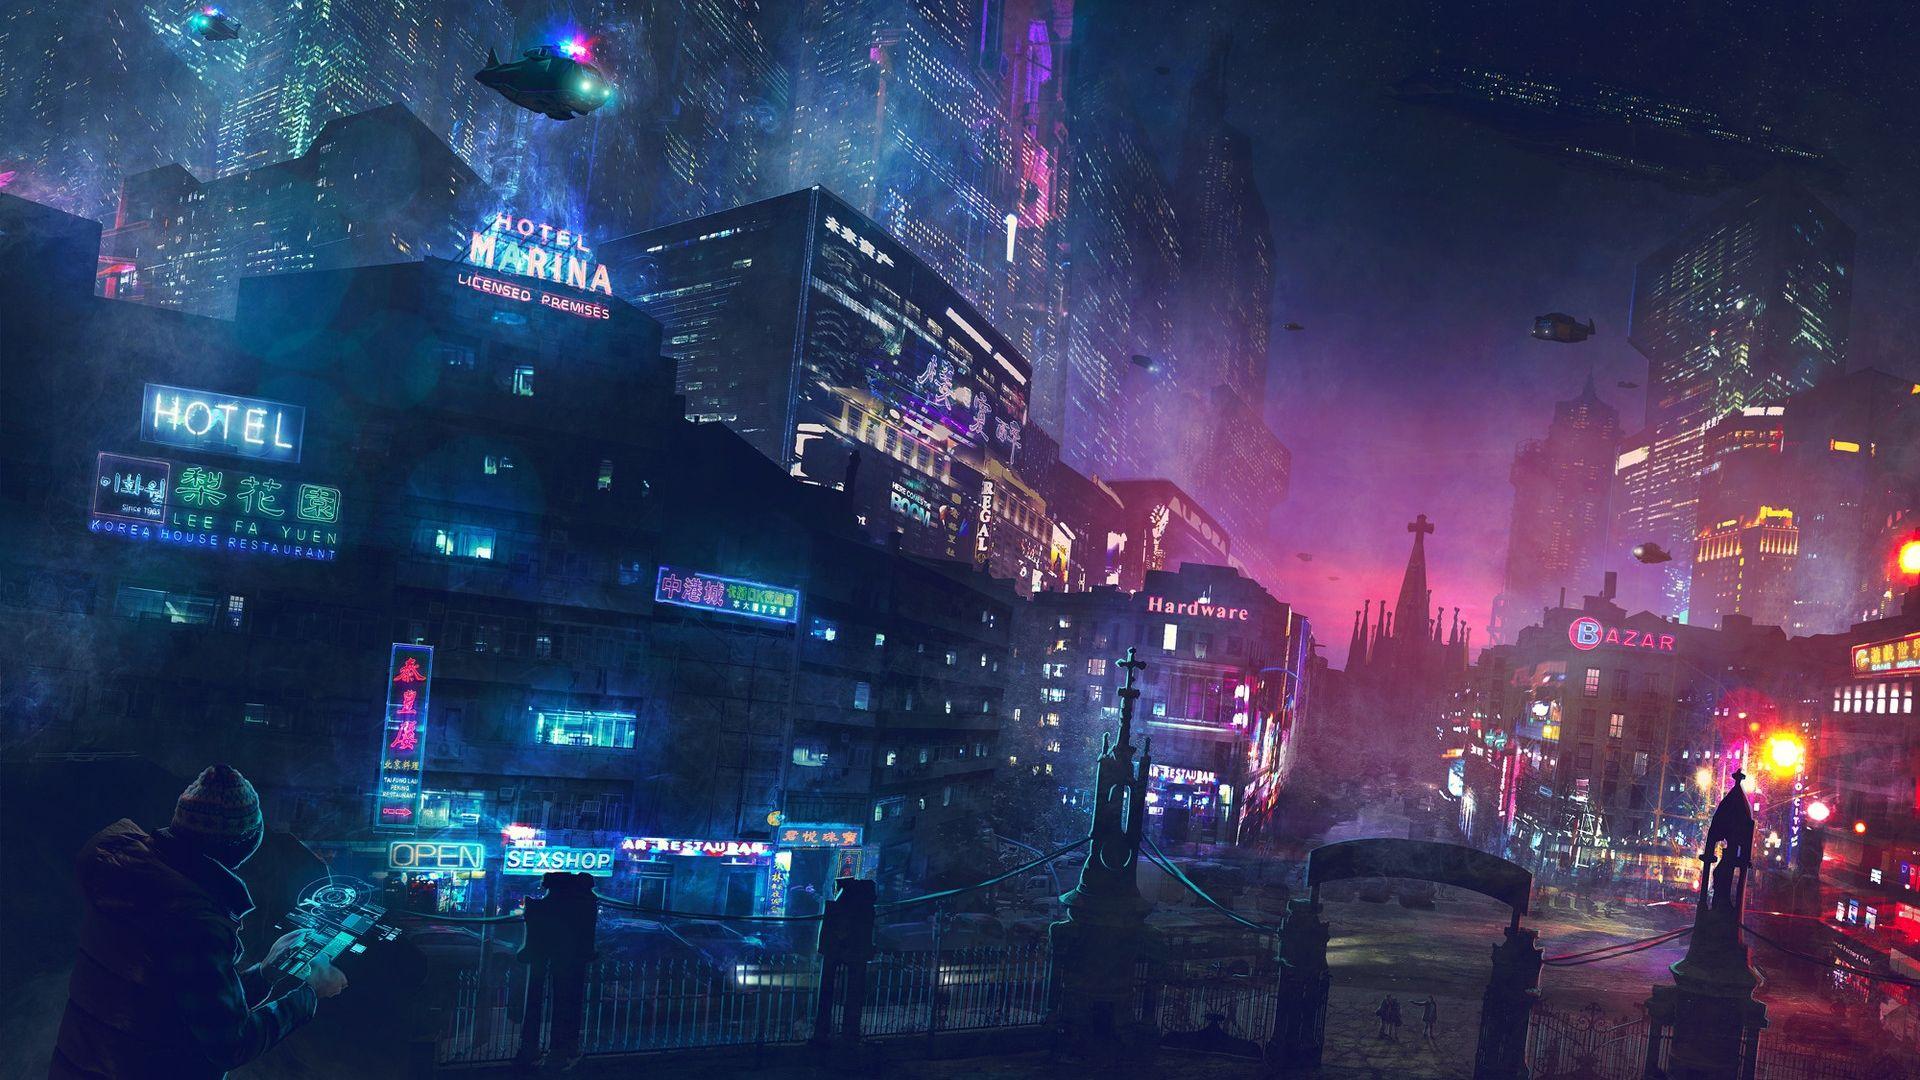 Cyberpunk Ish Wallpaper Dump 1080p Album On Imgur Cyberpunk City Futuristic City Sci Fi City